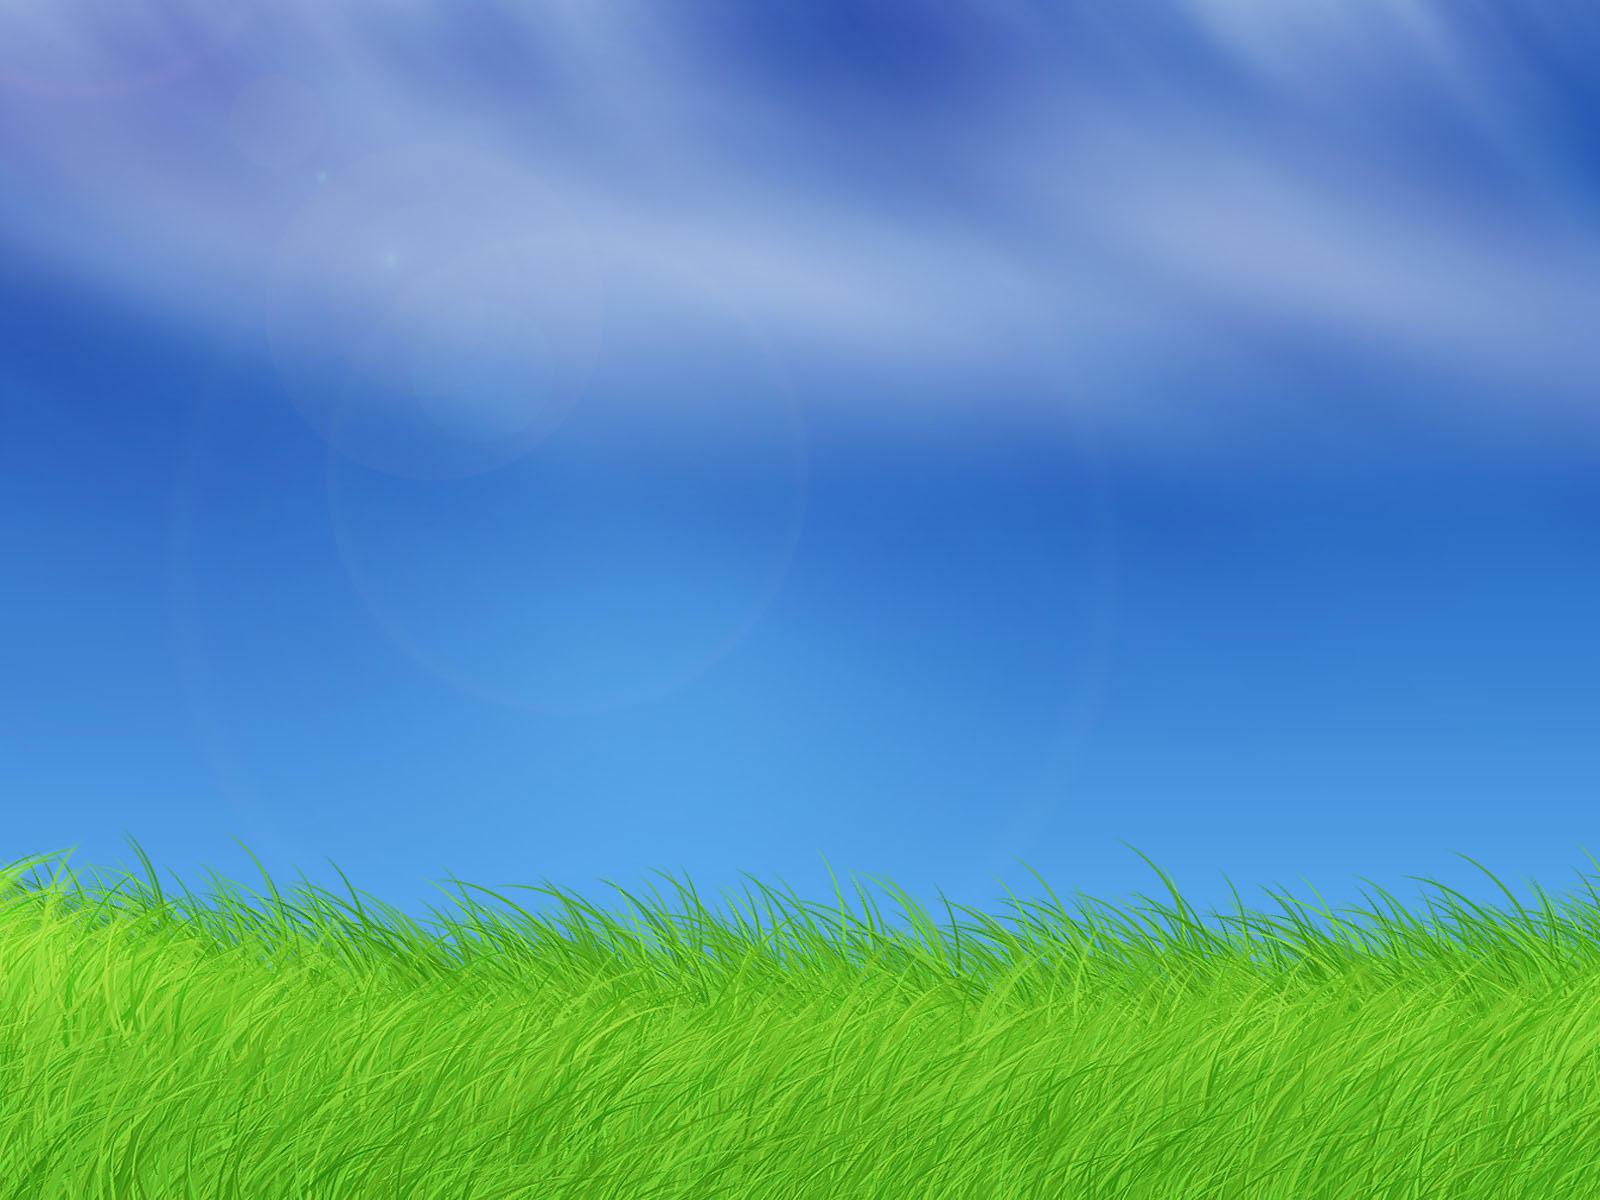 Grass Background 18860 1920x1200 px